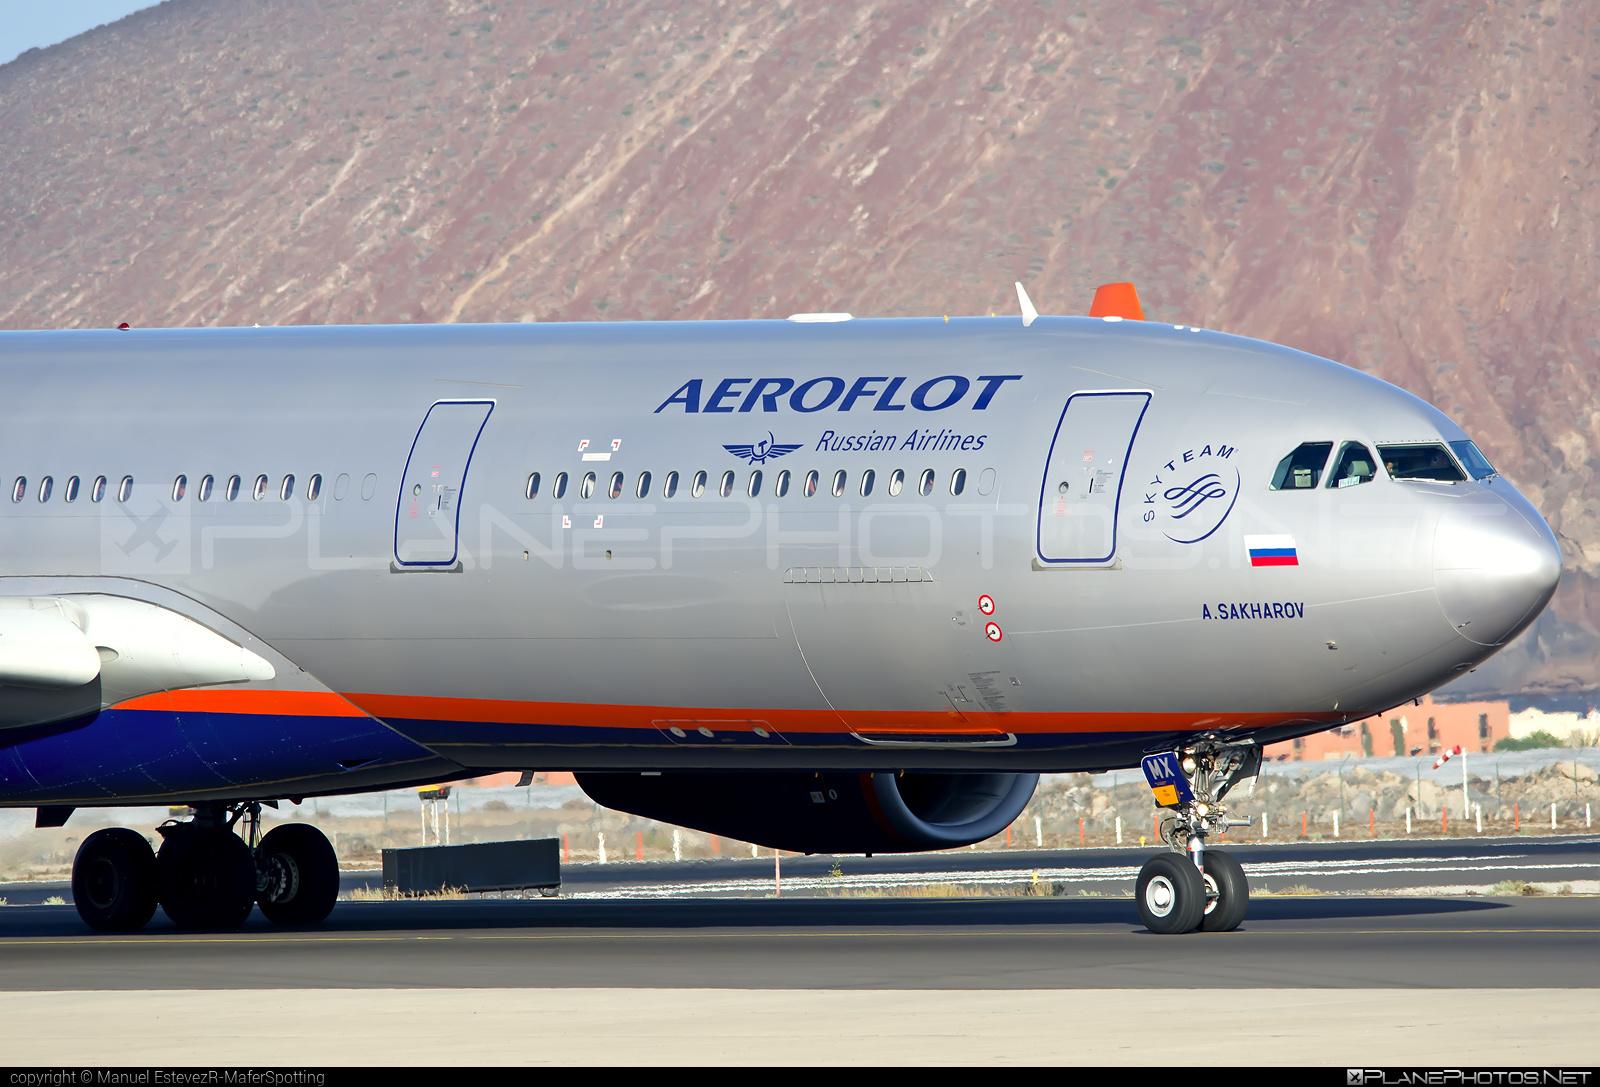 Airbus A330-343 - VQ-BMX operated by Aeroflot #a330 #a330family #aeroflot #airbus #airbus330